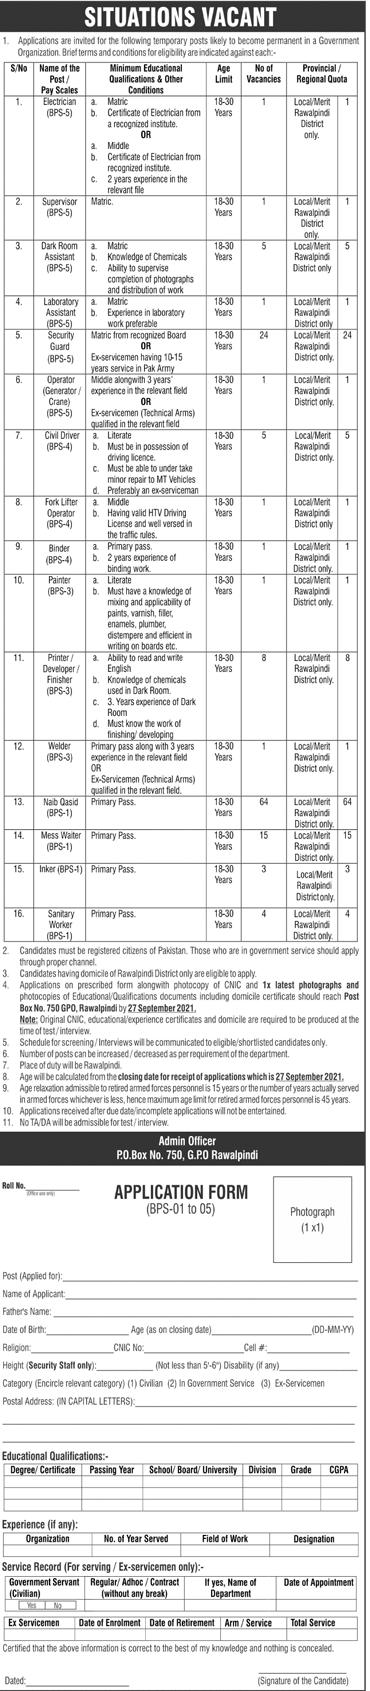 Pakistan Army GHQ Latest Jobs 2021 - Po BOX 750